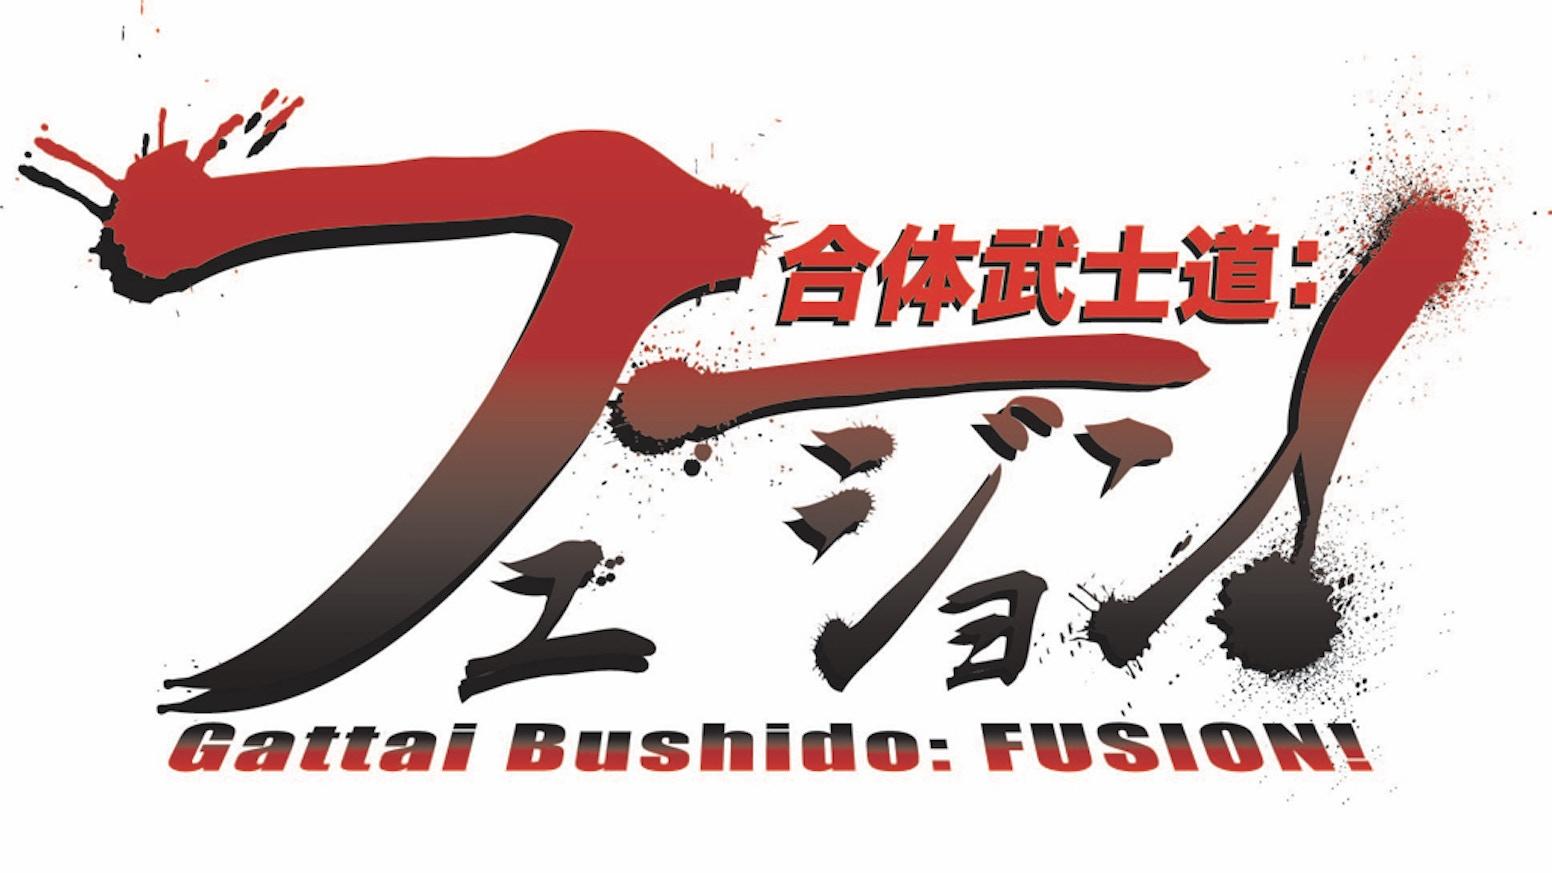 Gattaibushido:FUSION! Mecha Pilot RPG by Nathanael Cole